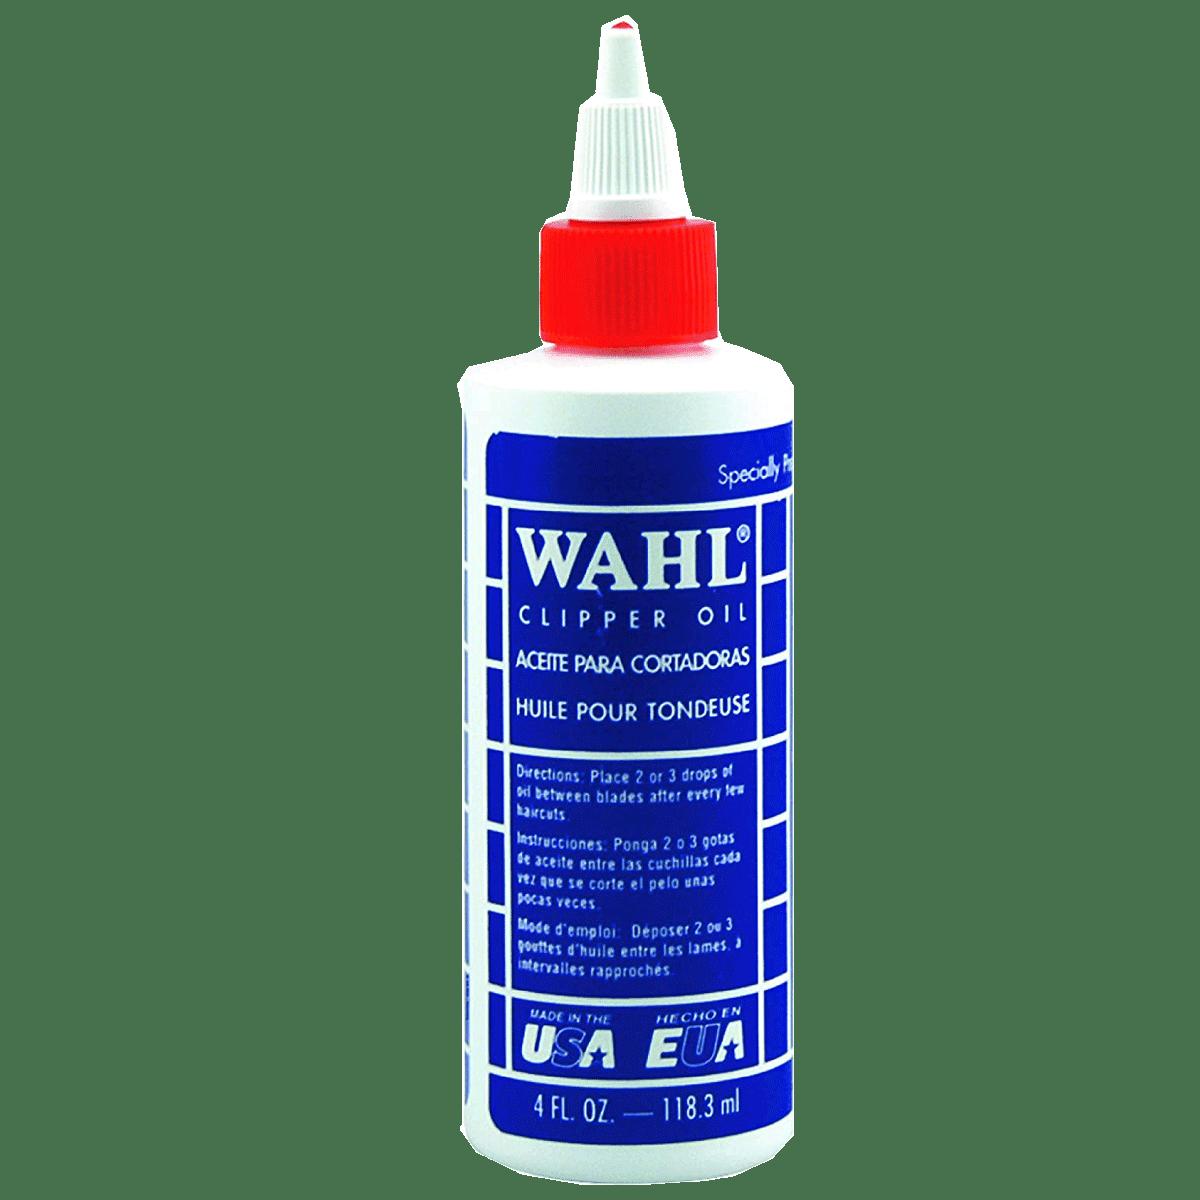 WAHL Clipper Blade Oil (03310-024, White)